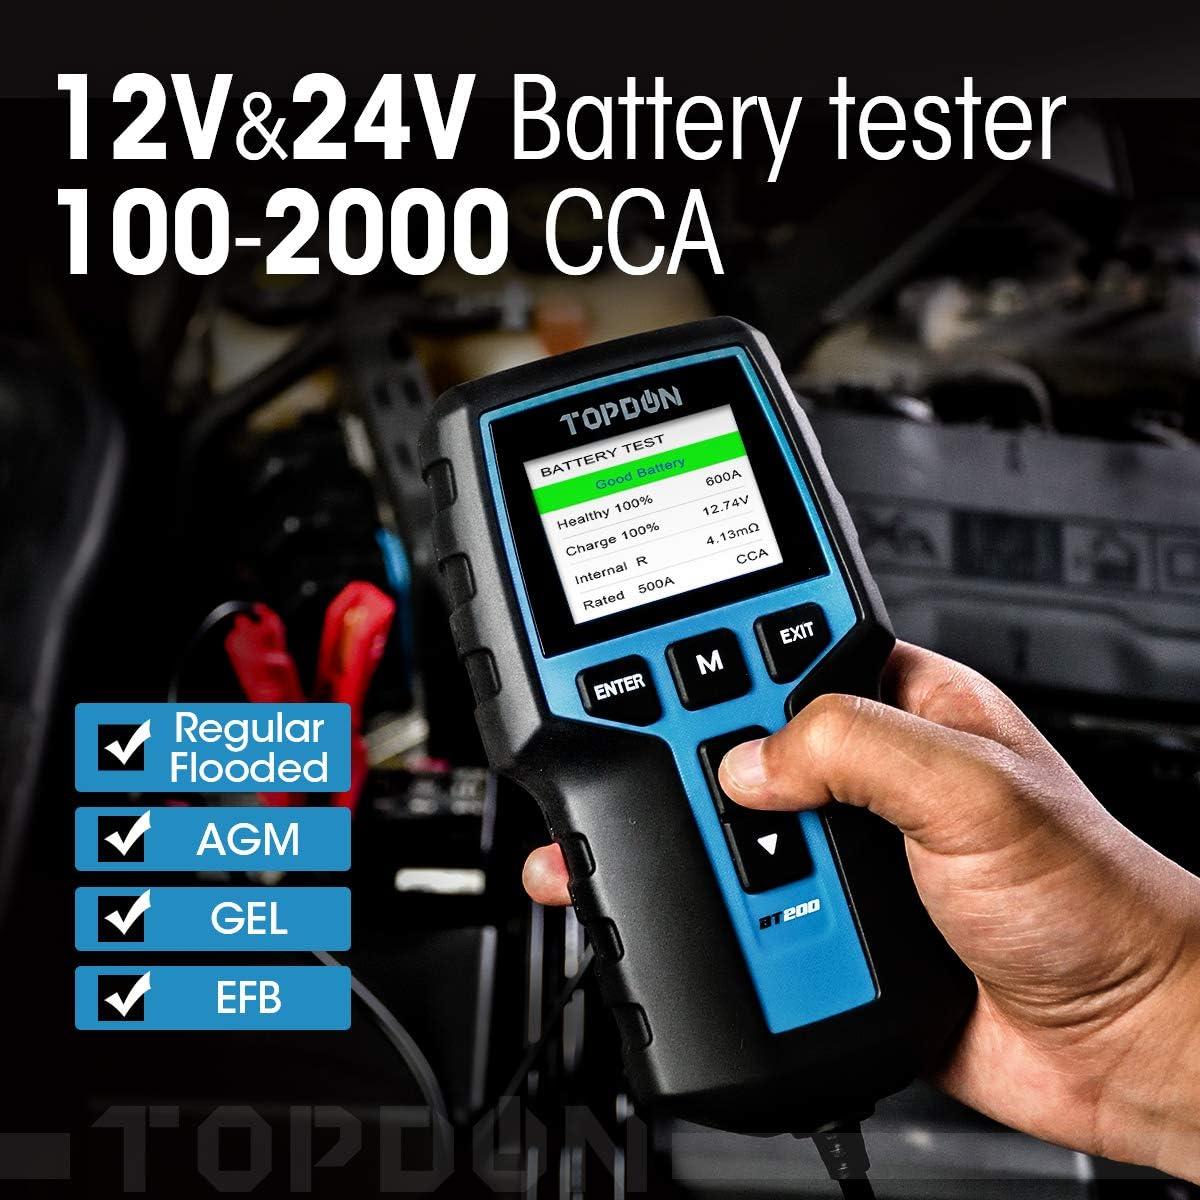 BT200 100-2000CCA Automotive Alternator Tester Digital Auto Battery Analyzer Charging Cranking System Tester for Car Truck Motorcycle ATV SUV Boat Yacht Topdon Car Battery Tester 12V 24V Load Tester